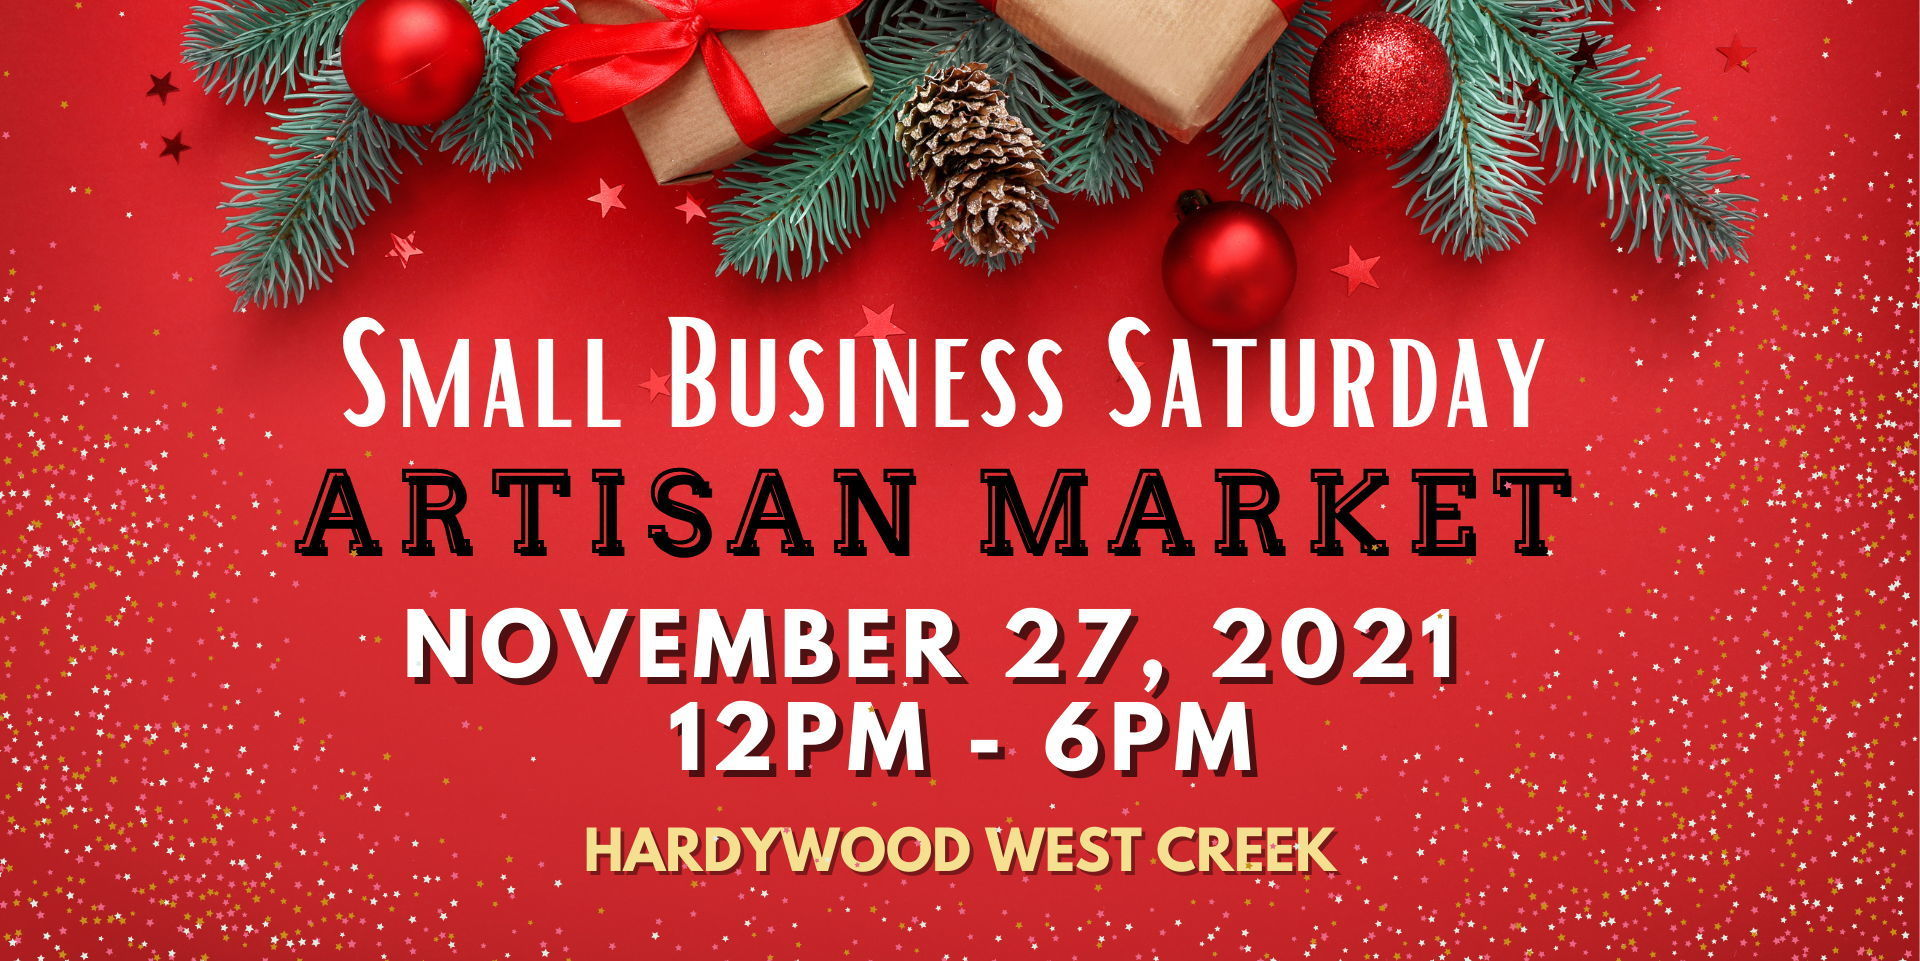 Small Business Saturday Artisan Market